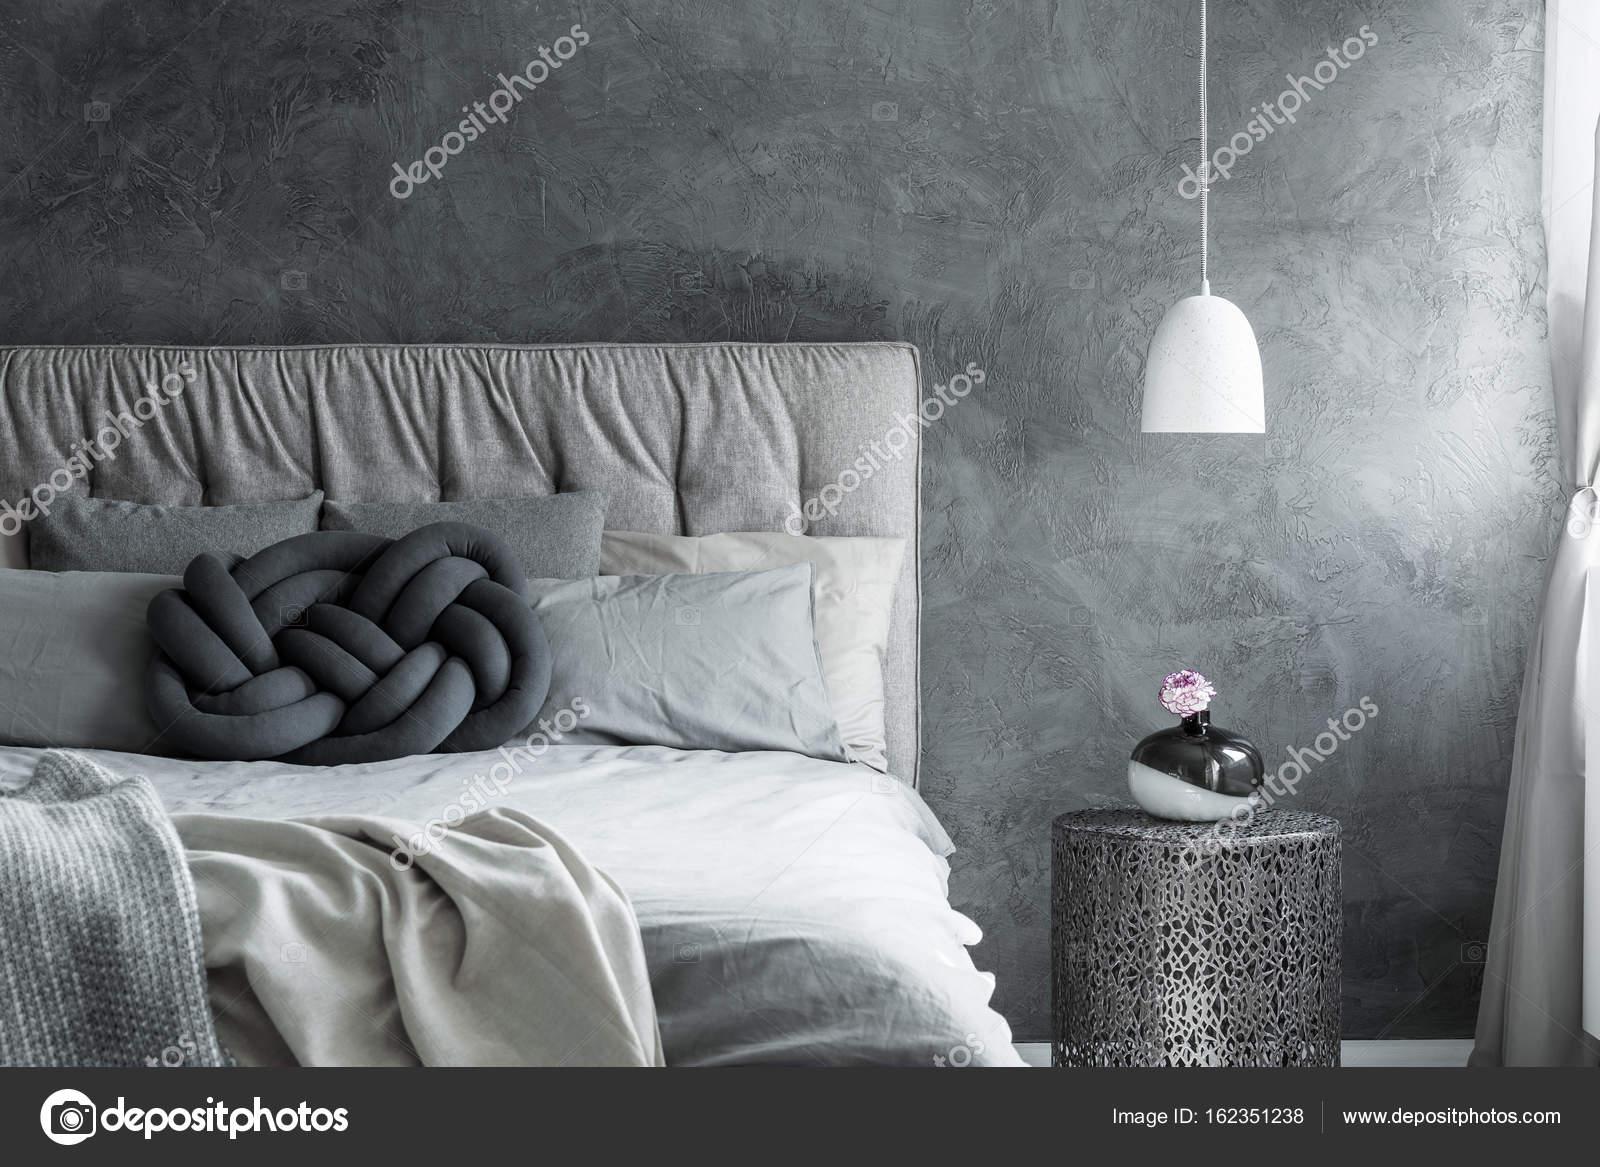 Schlafzimmer mit Diy Knoten Kissen — Stockfoto © photographee.eu ...